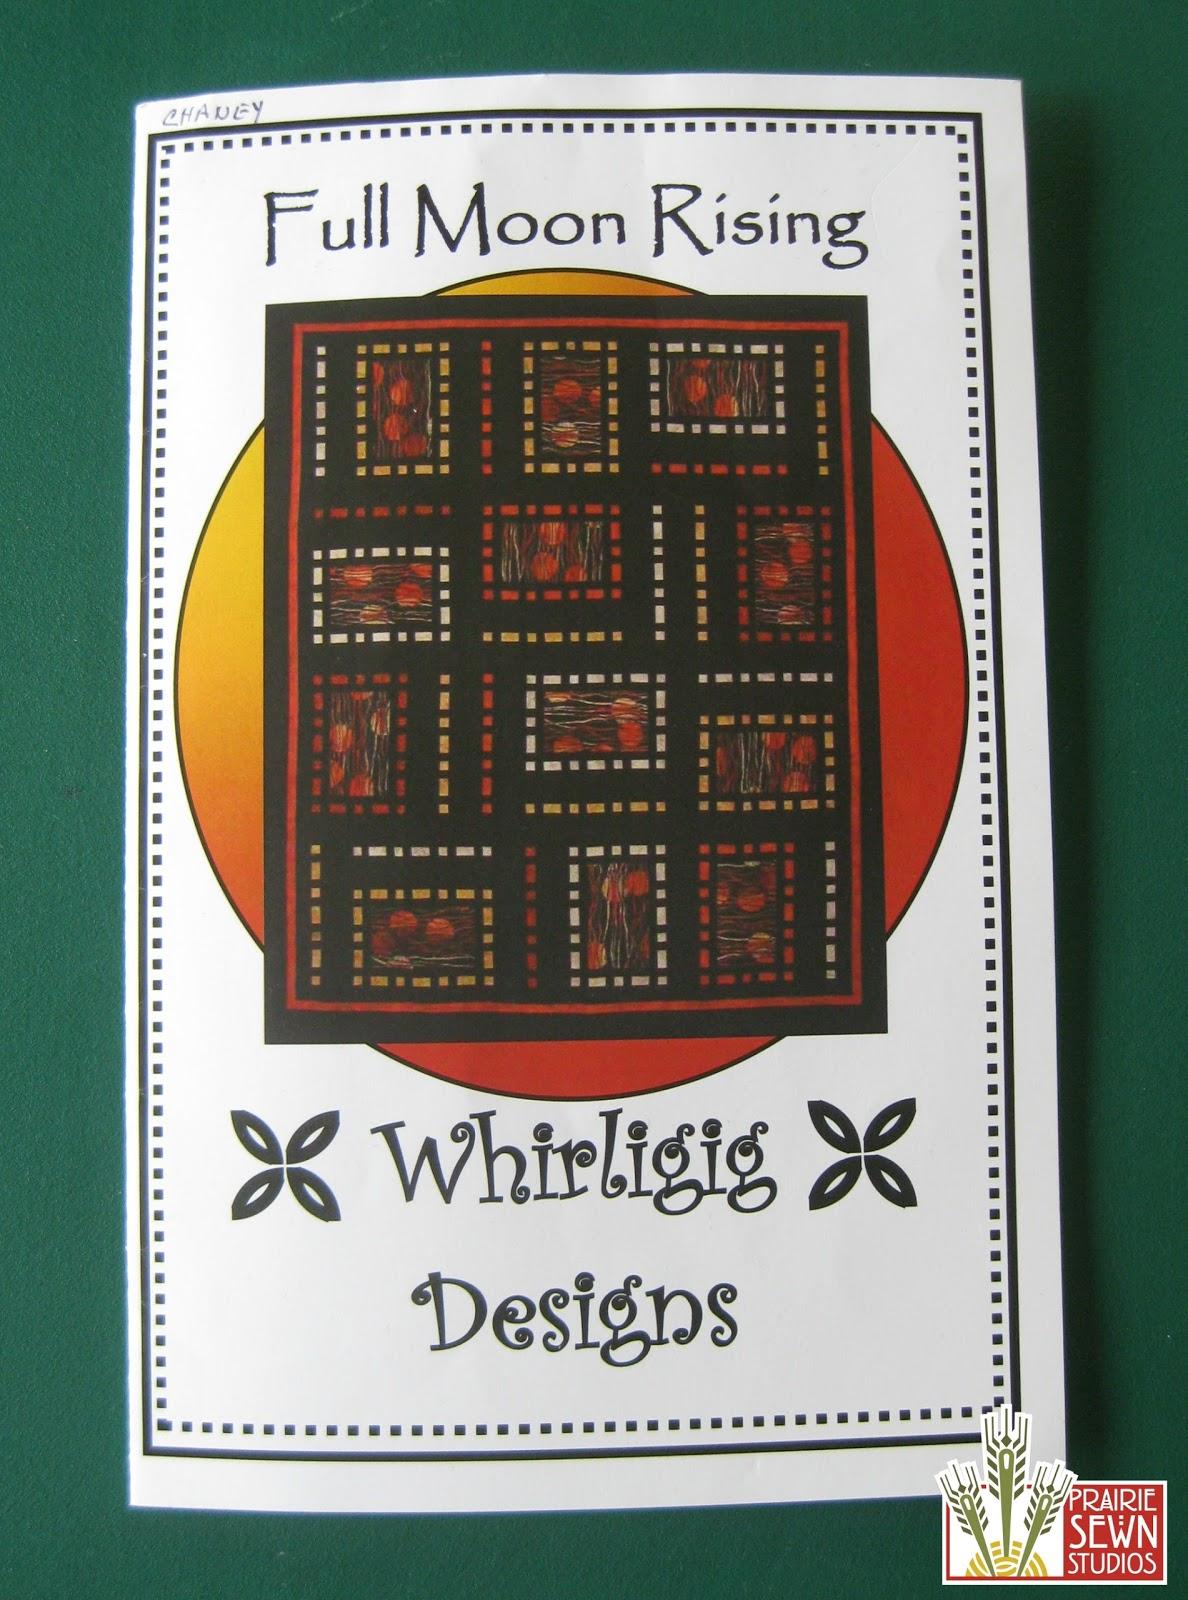 Full Moon Rising by Whirligig Designs